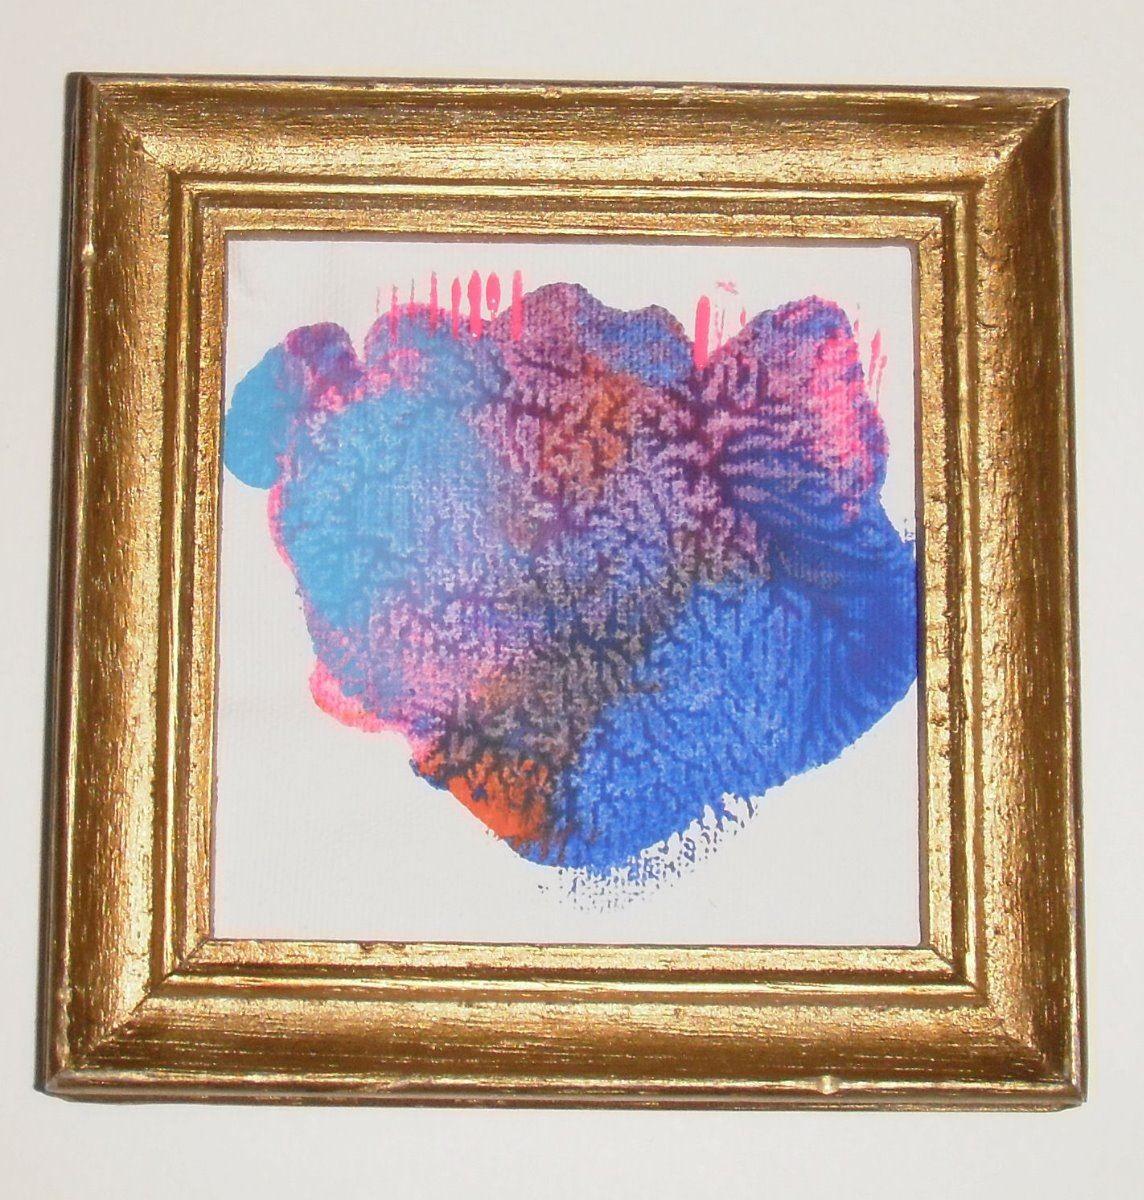 Original Painting Langdonart Pink Blue Trees Peinture Originale Par Langdonart Arbres Roses Bleu